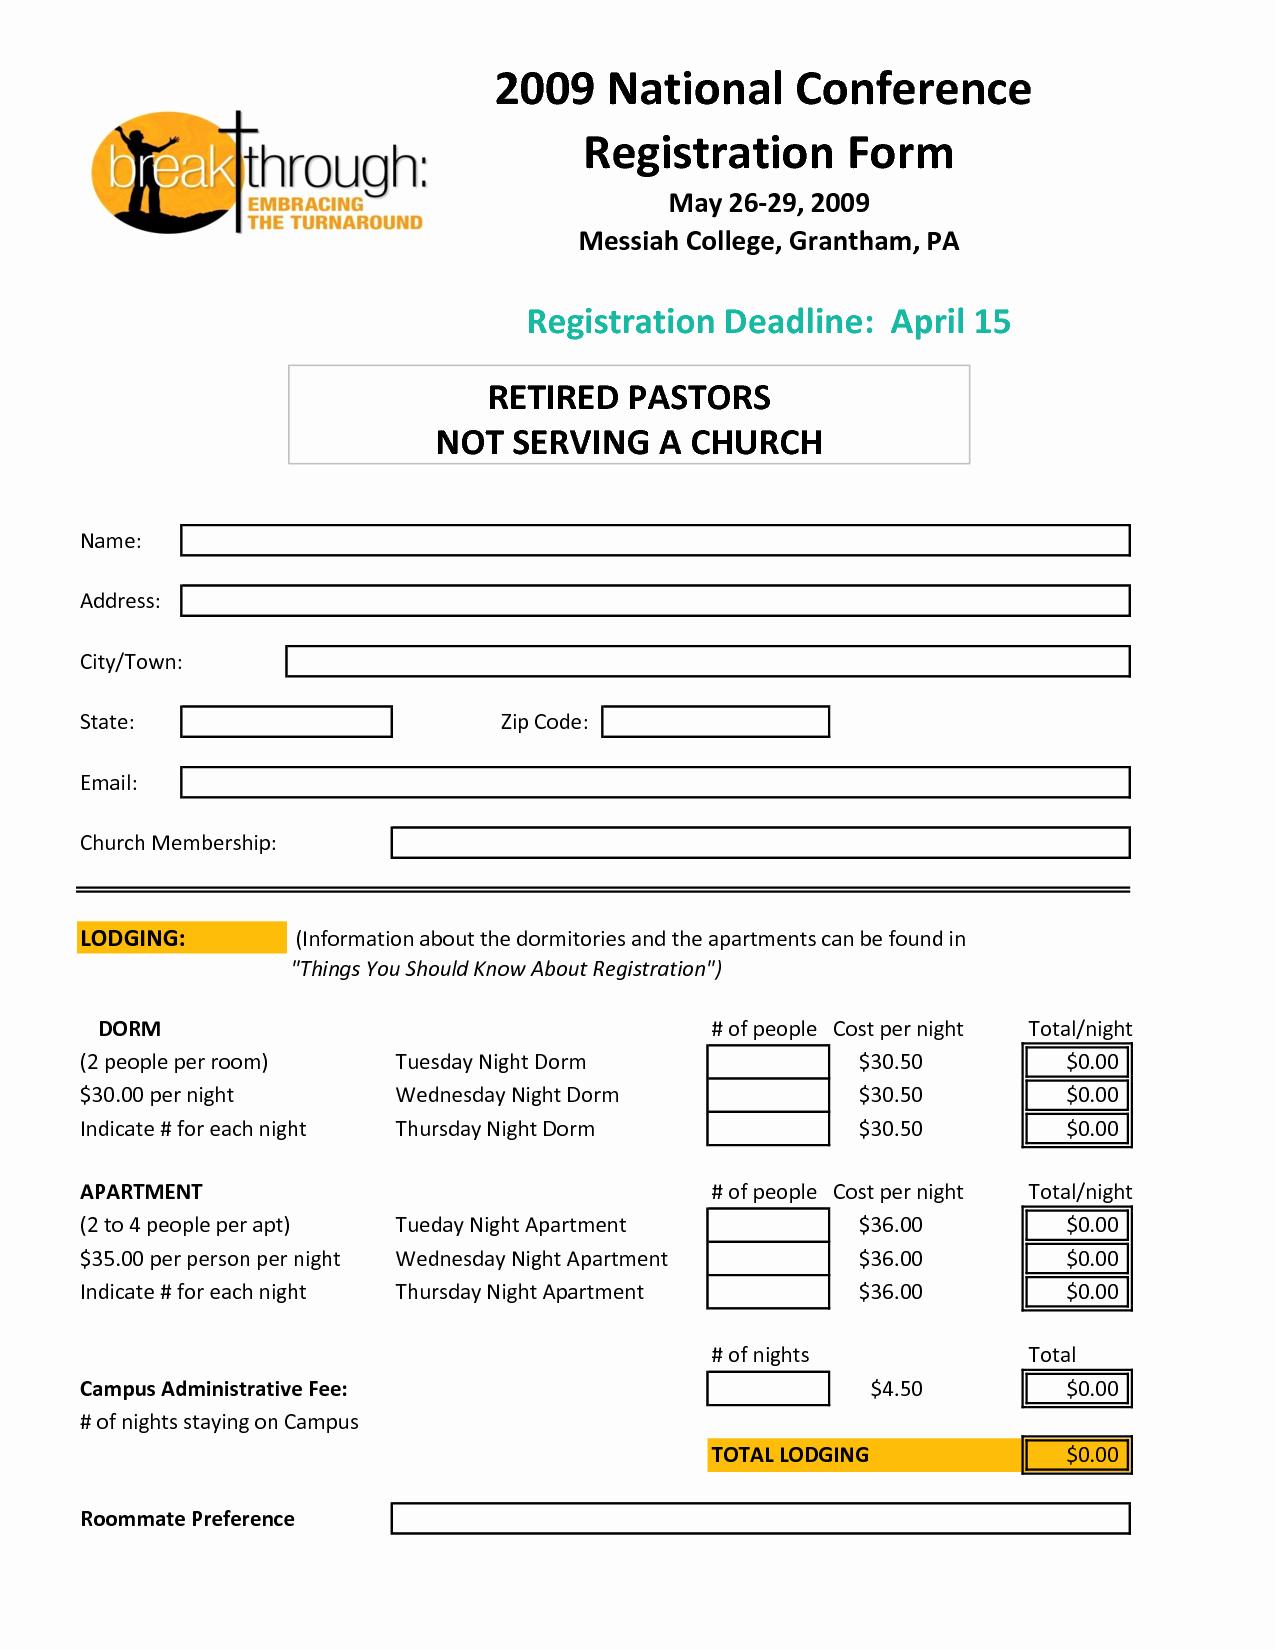 Registration form Template Microsoft Word Luxury Registration form Template